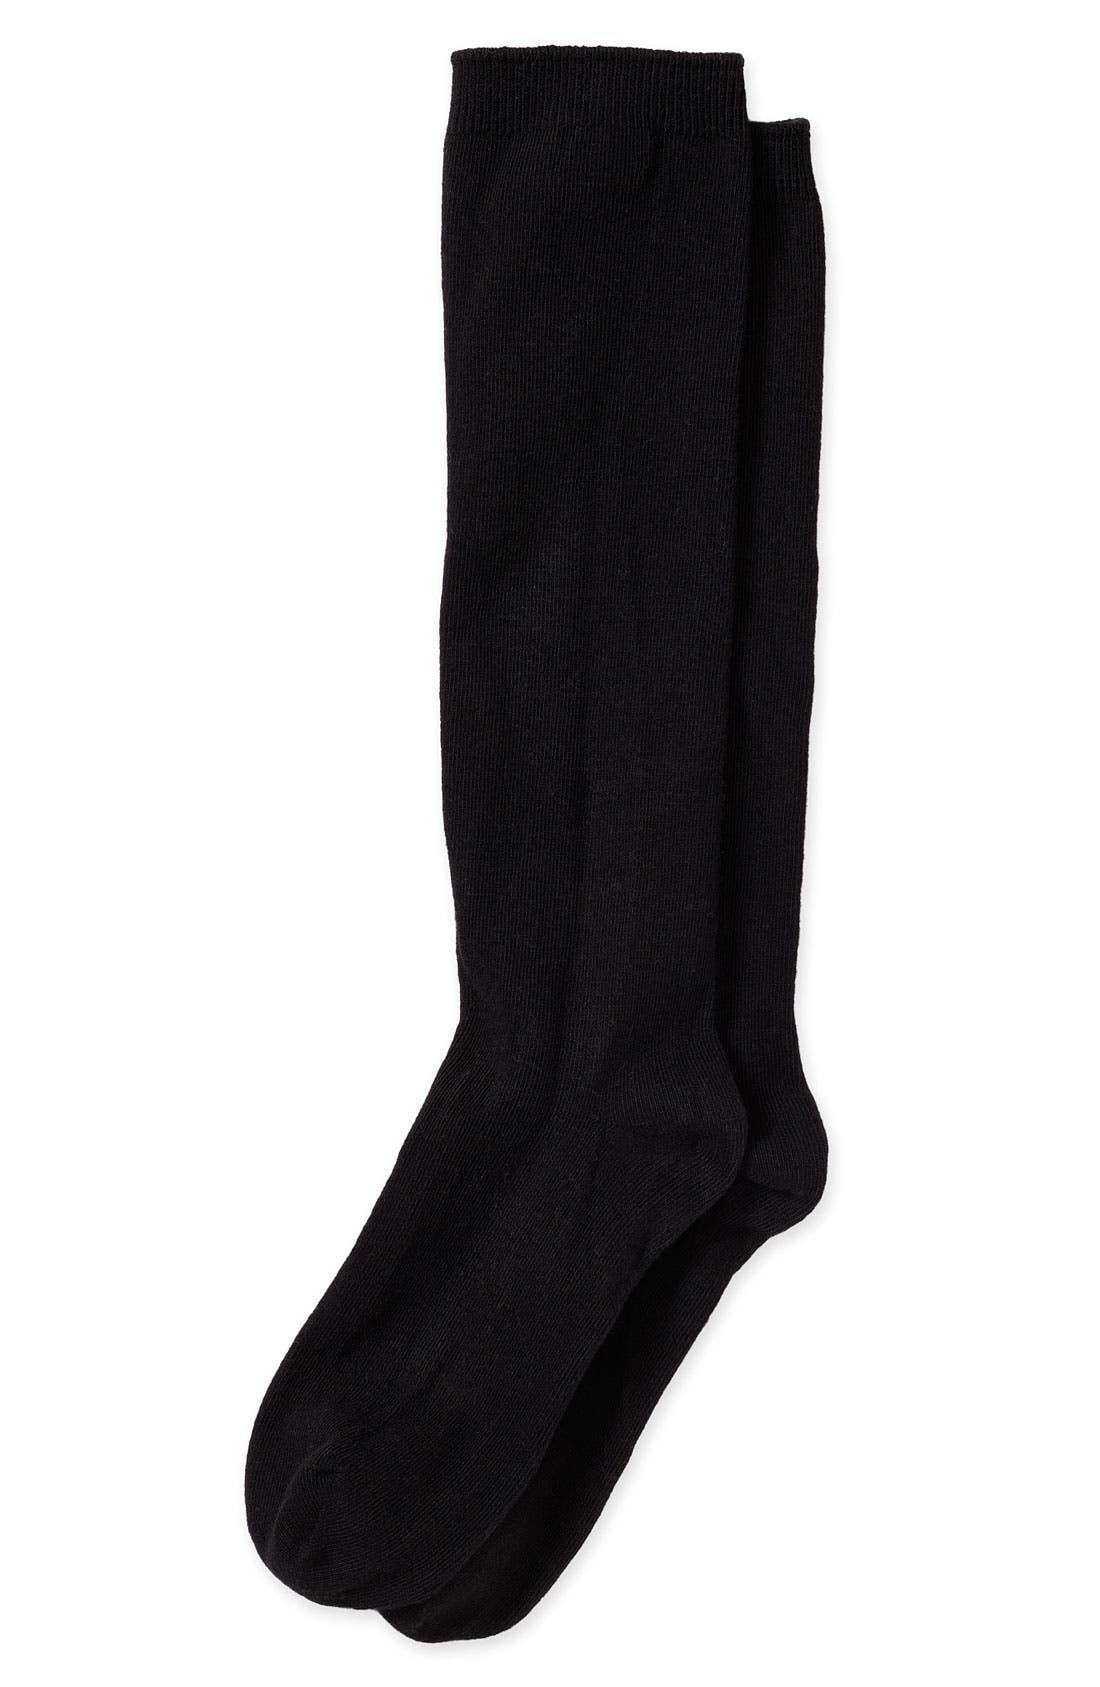 NORDSTROM Knee High Socks, Main, color, 001